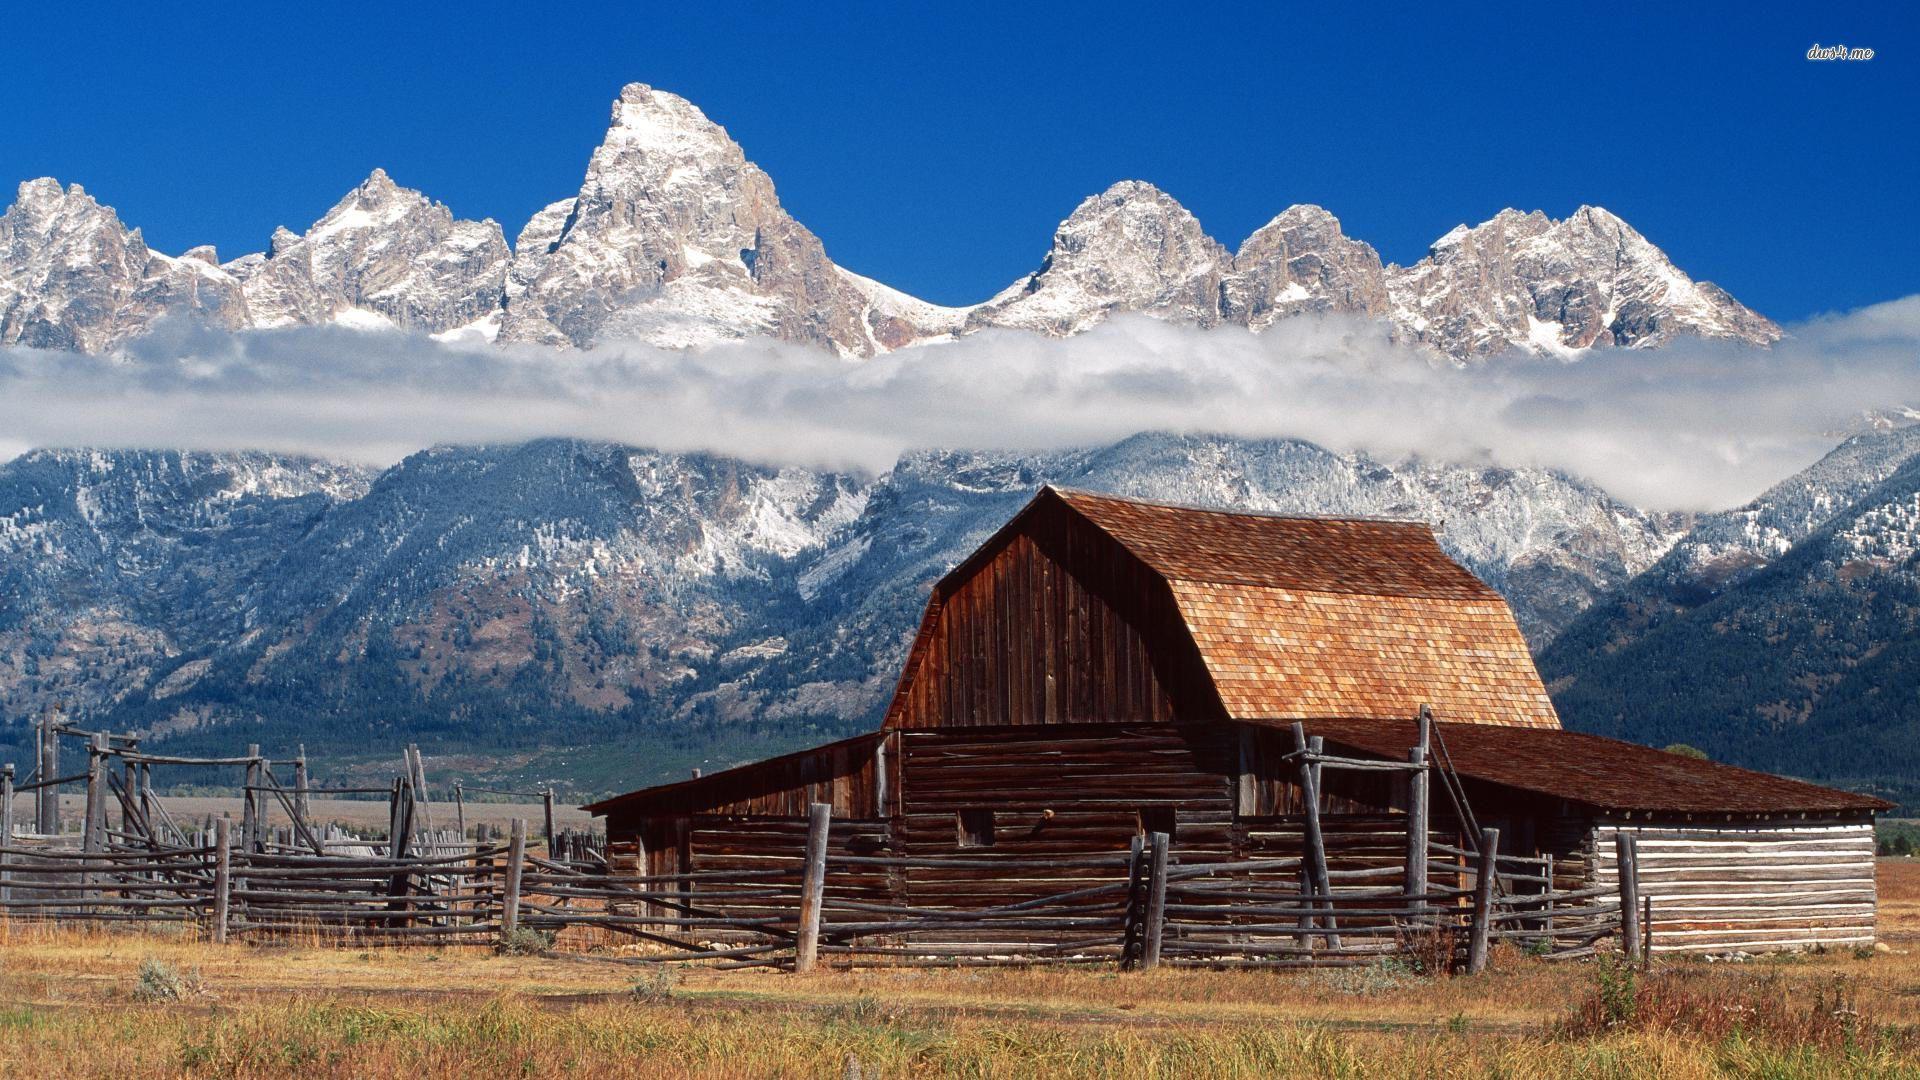 Teton Barn Jackson Hole Wyoming wallpapers HD   267312 1920x1080